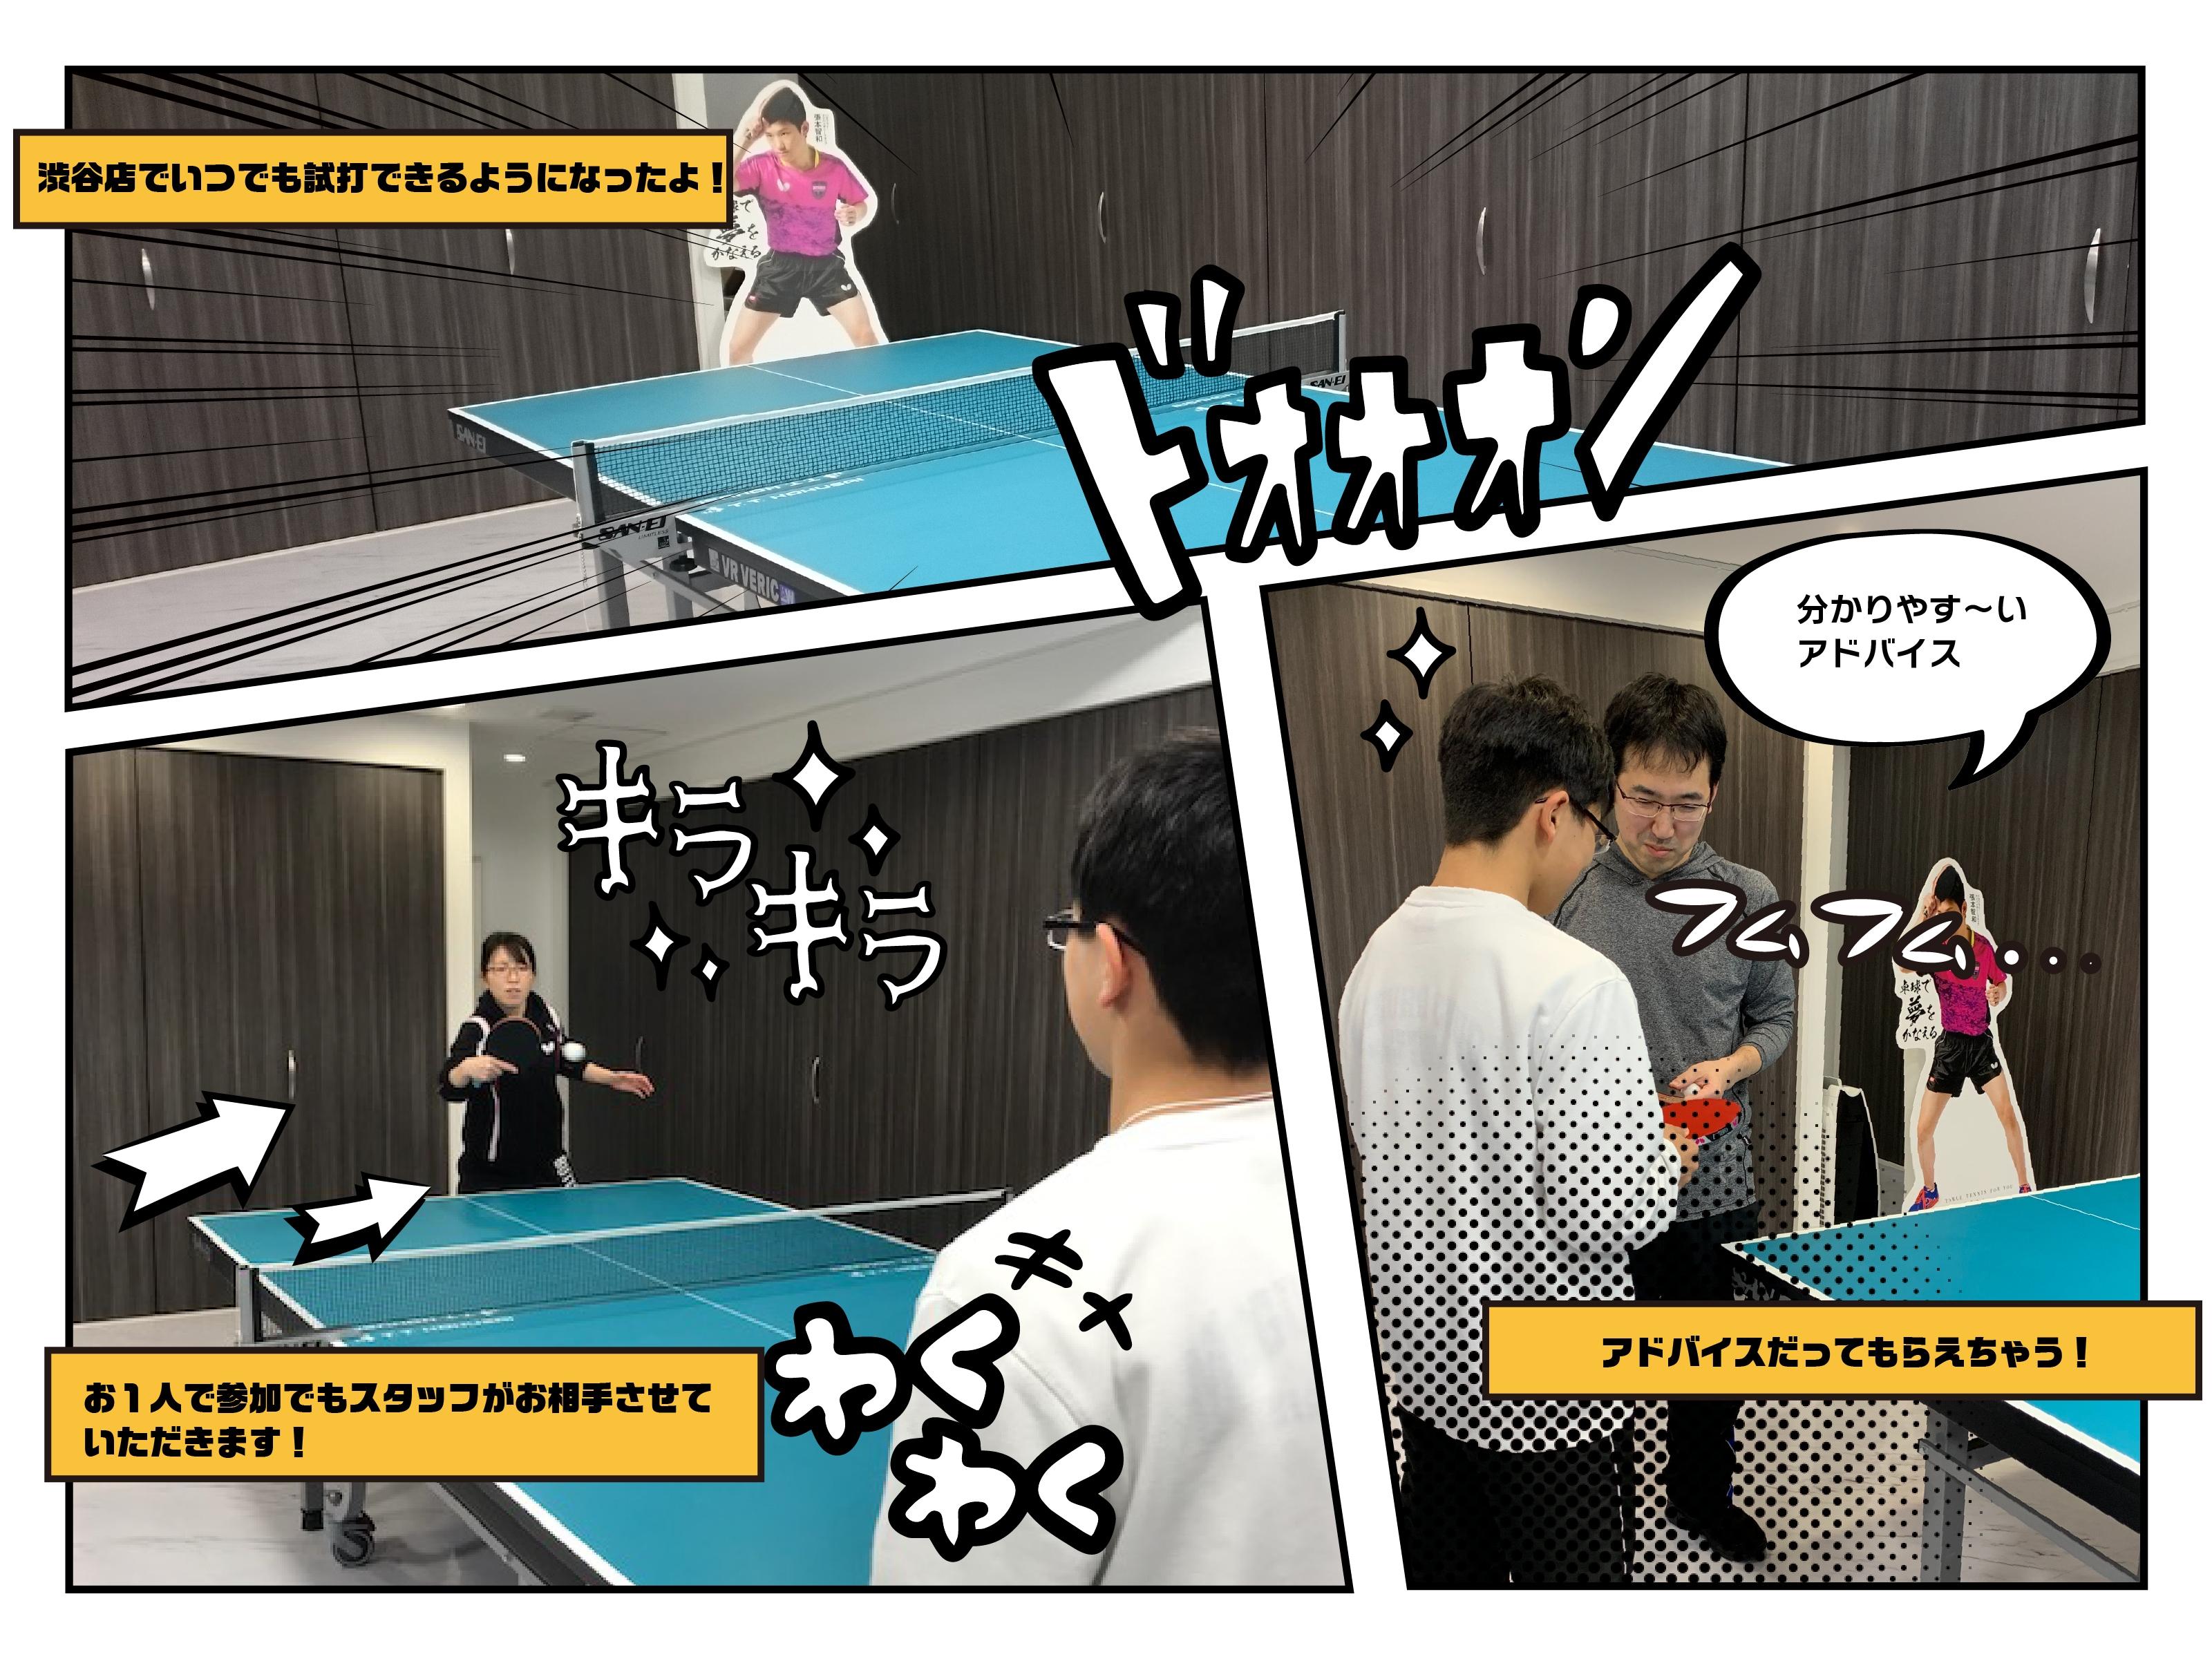 国際卓球渋谷店でお手軽試打体験